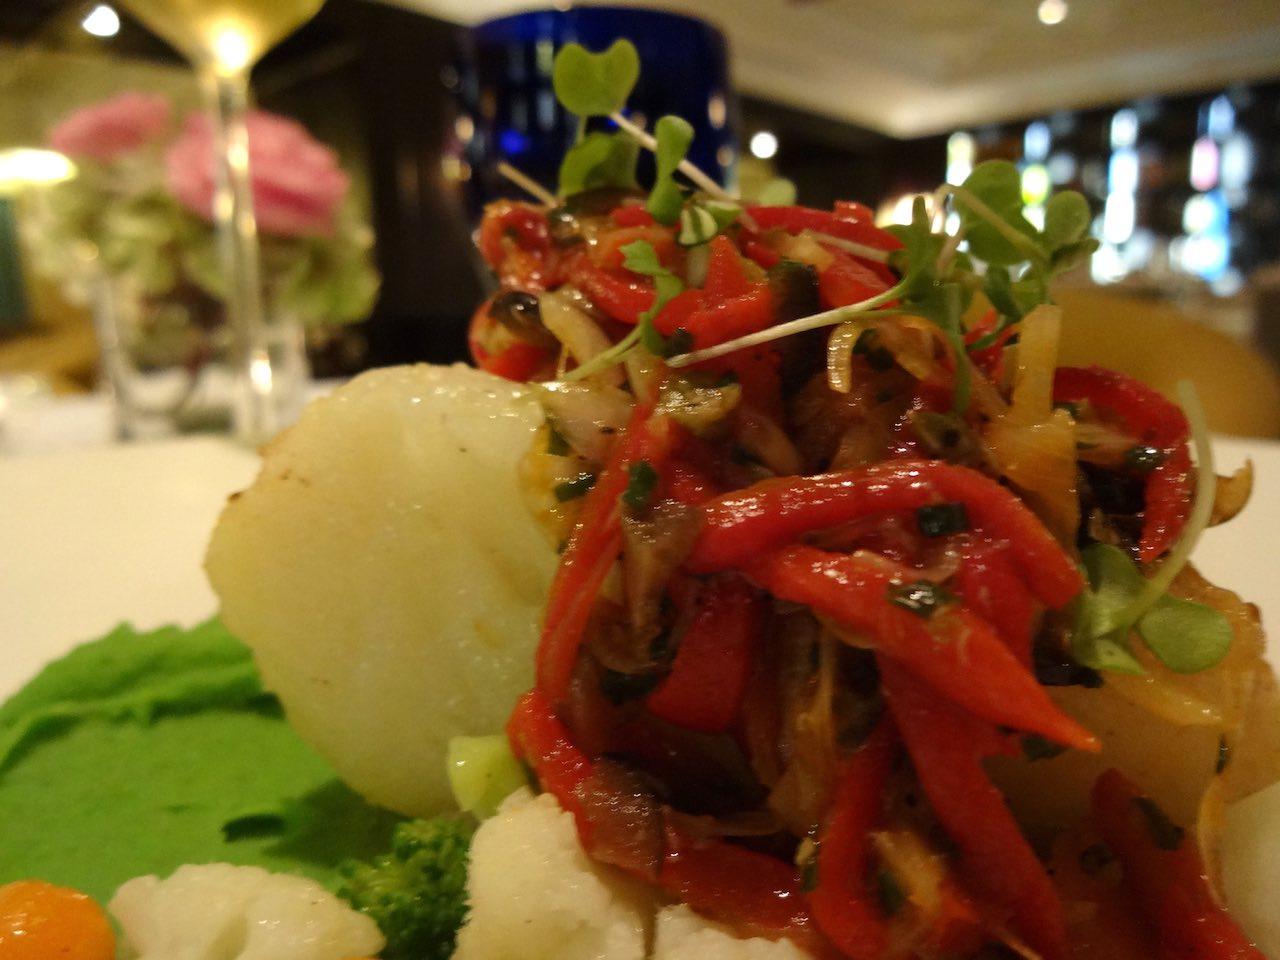 the-ritz-carlton-kl-kuala-lumpur-best-5-star-hotel-spa-weekend-getaway-luxurybucketlist-68